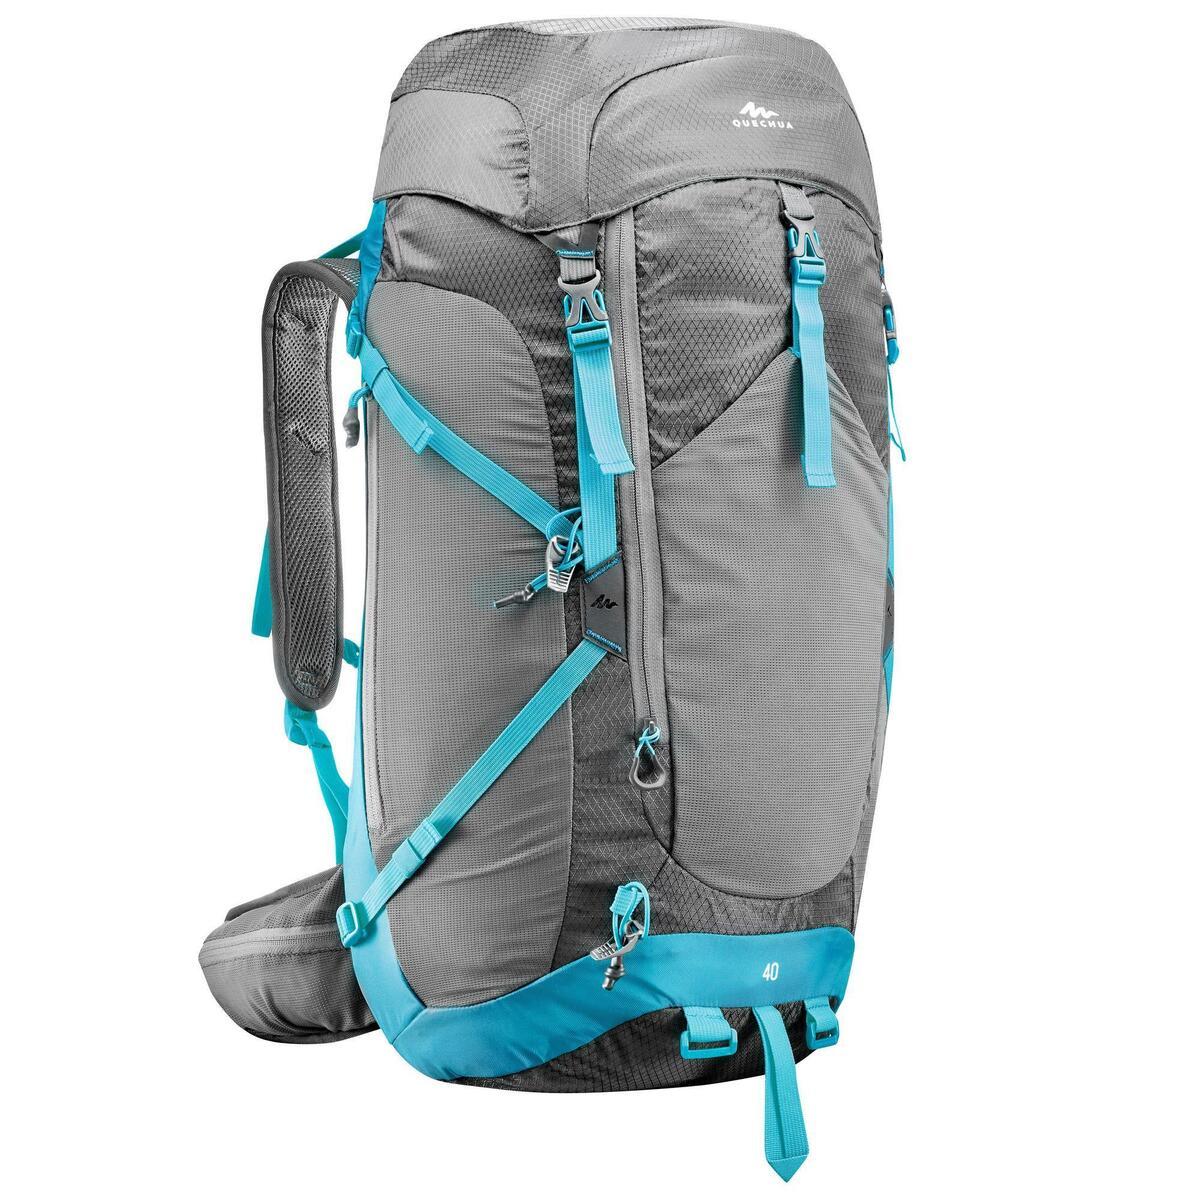 Bild 2 von Wanderrucksack Bergwandern MH500 40 Liter Damen grau/blau